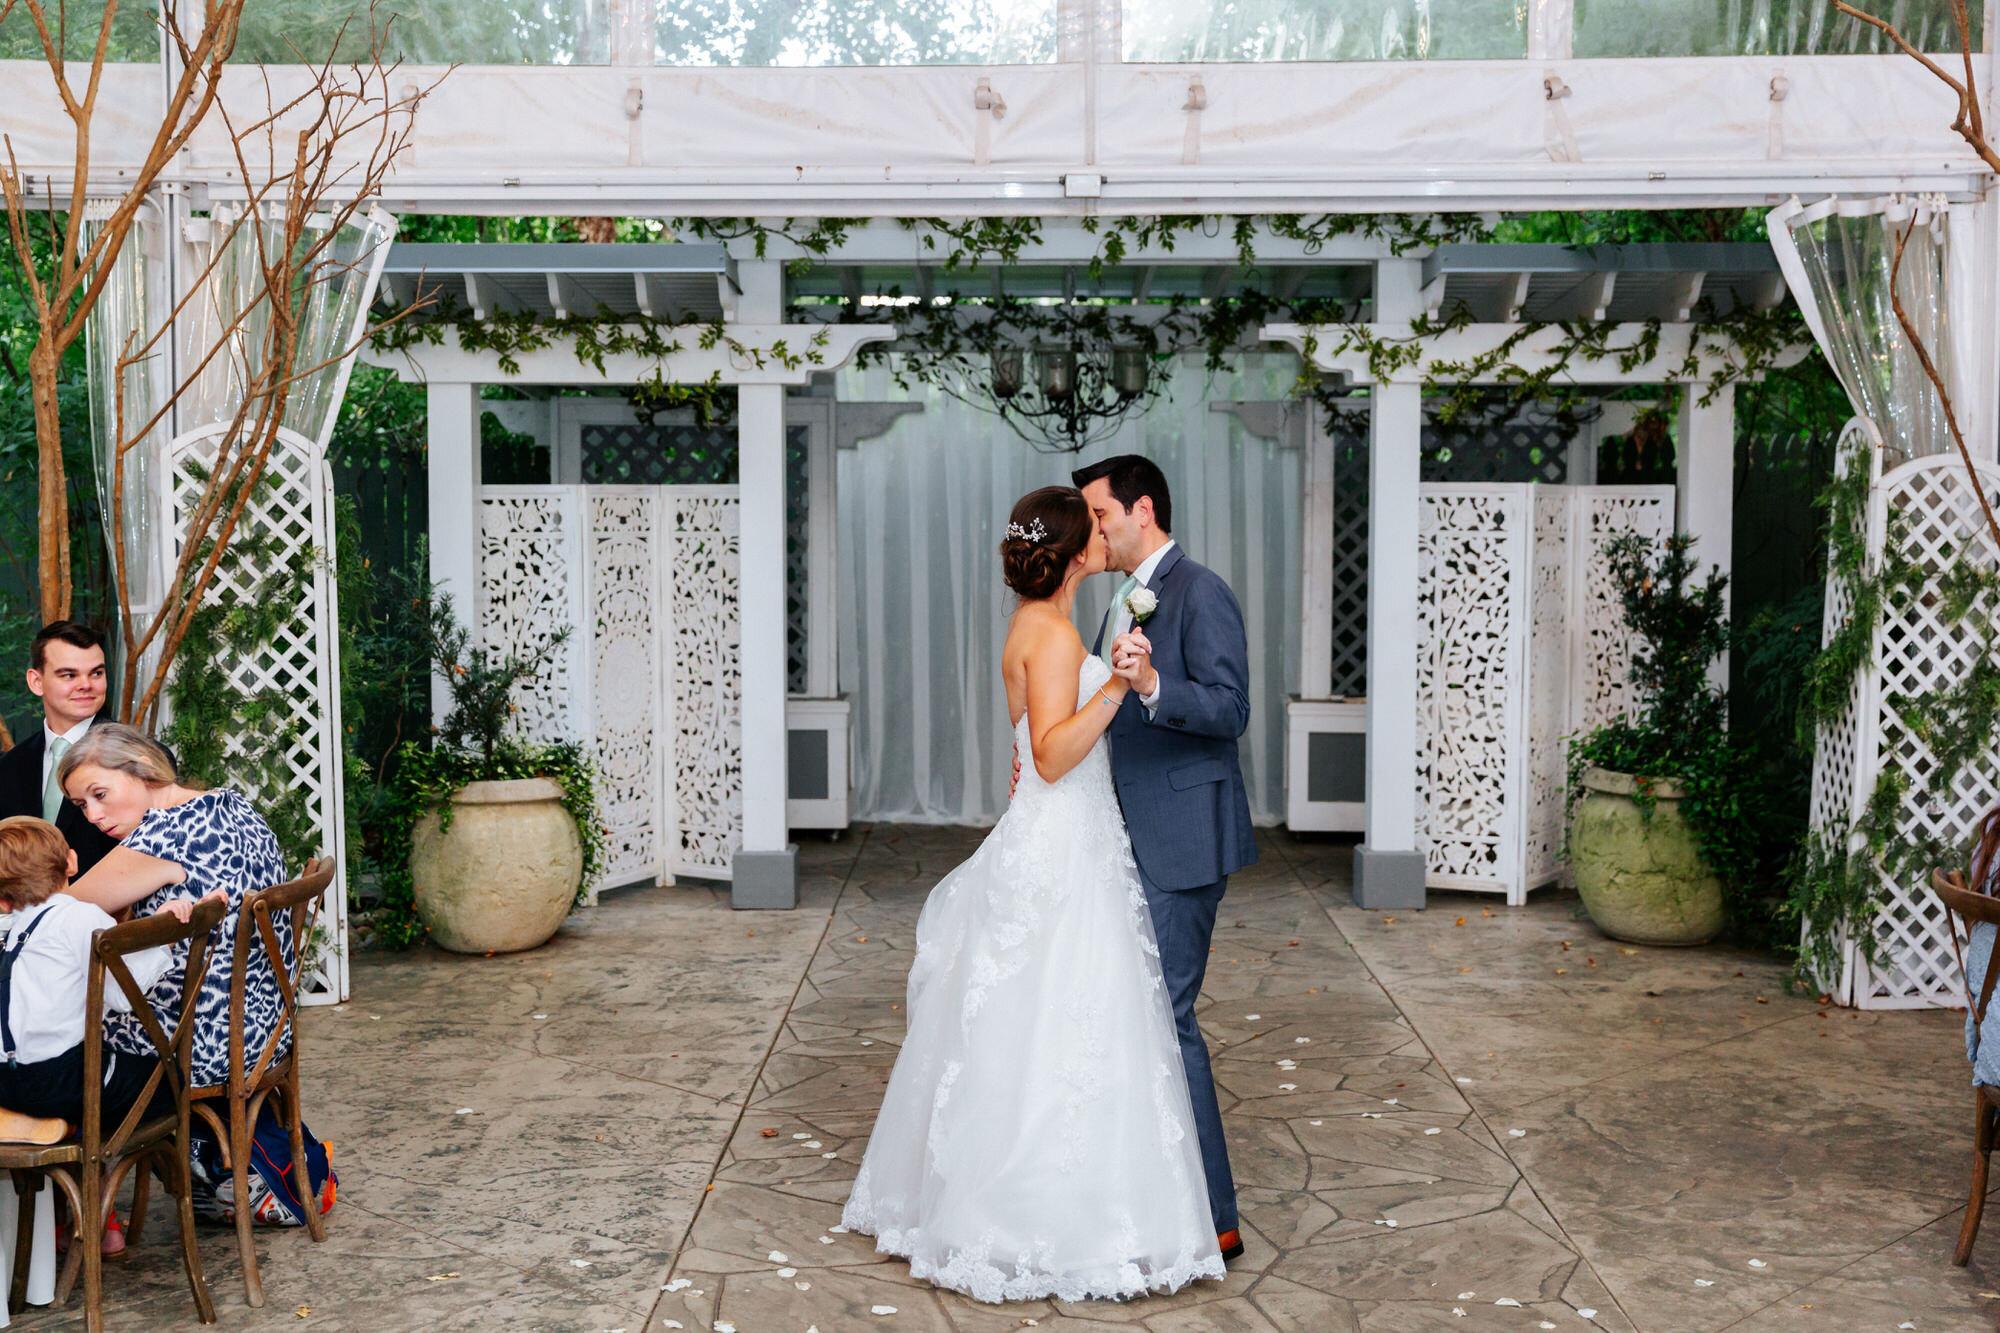 twigs-tempietto-wedding-greenville-downtown-357.JPG